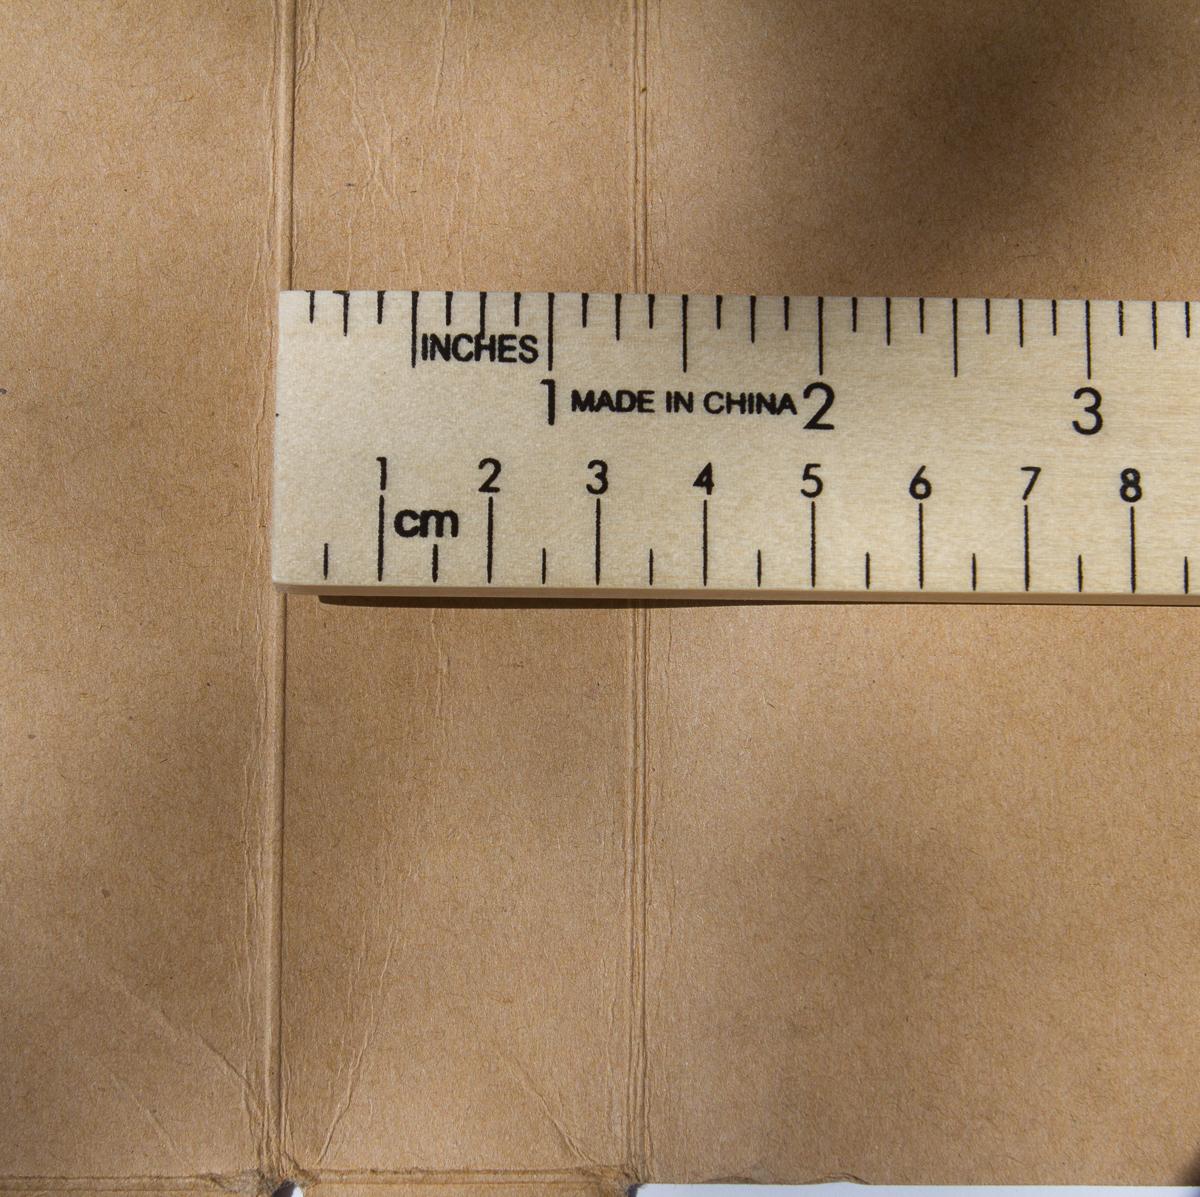 Glove_Box_measurments-237T.jpg